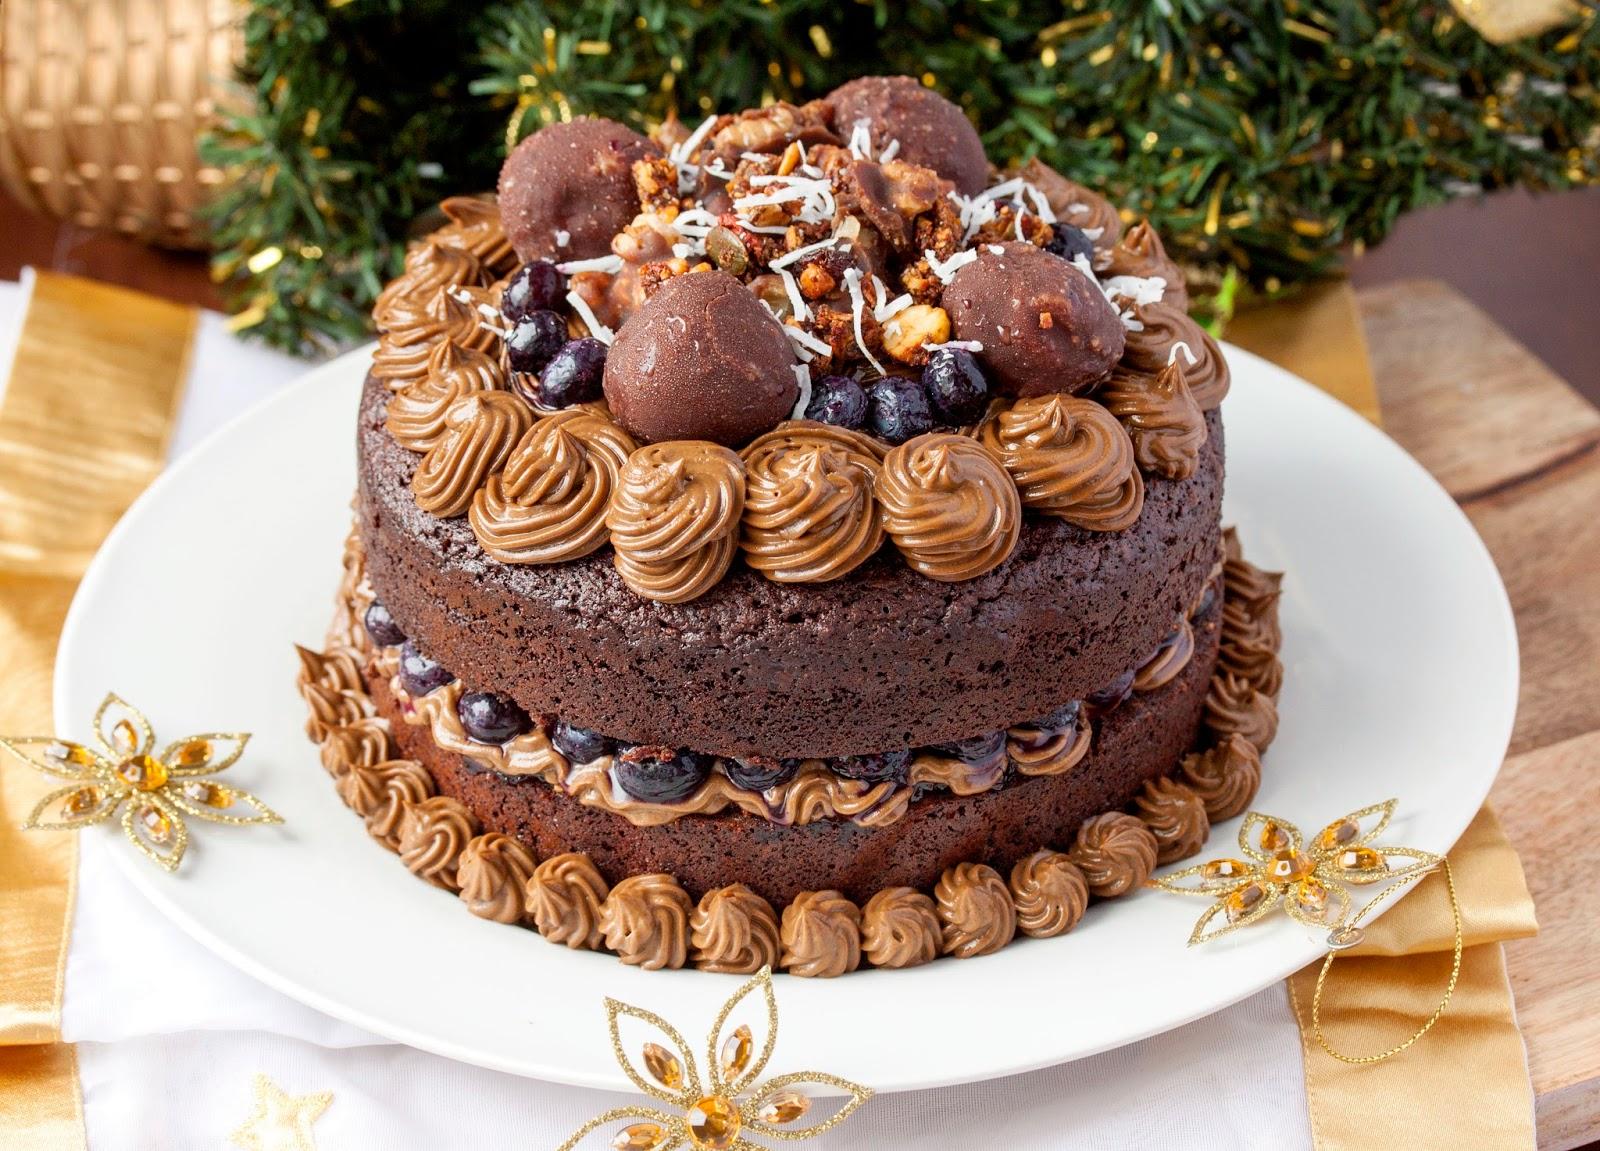 Chocolate Cake Recipe With Sunflower Seeds